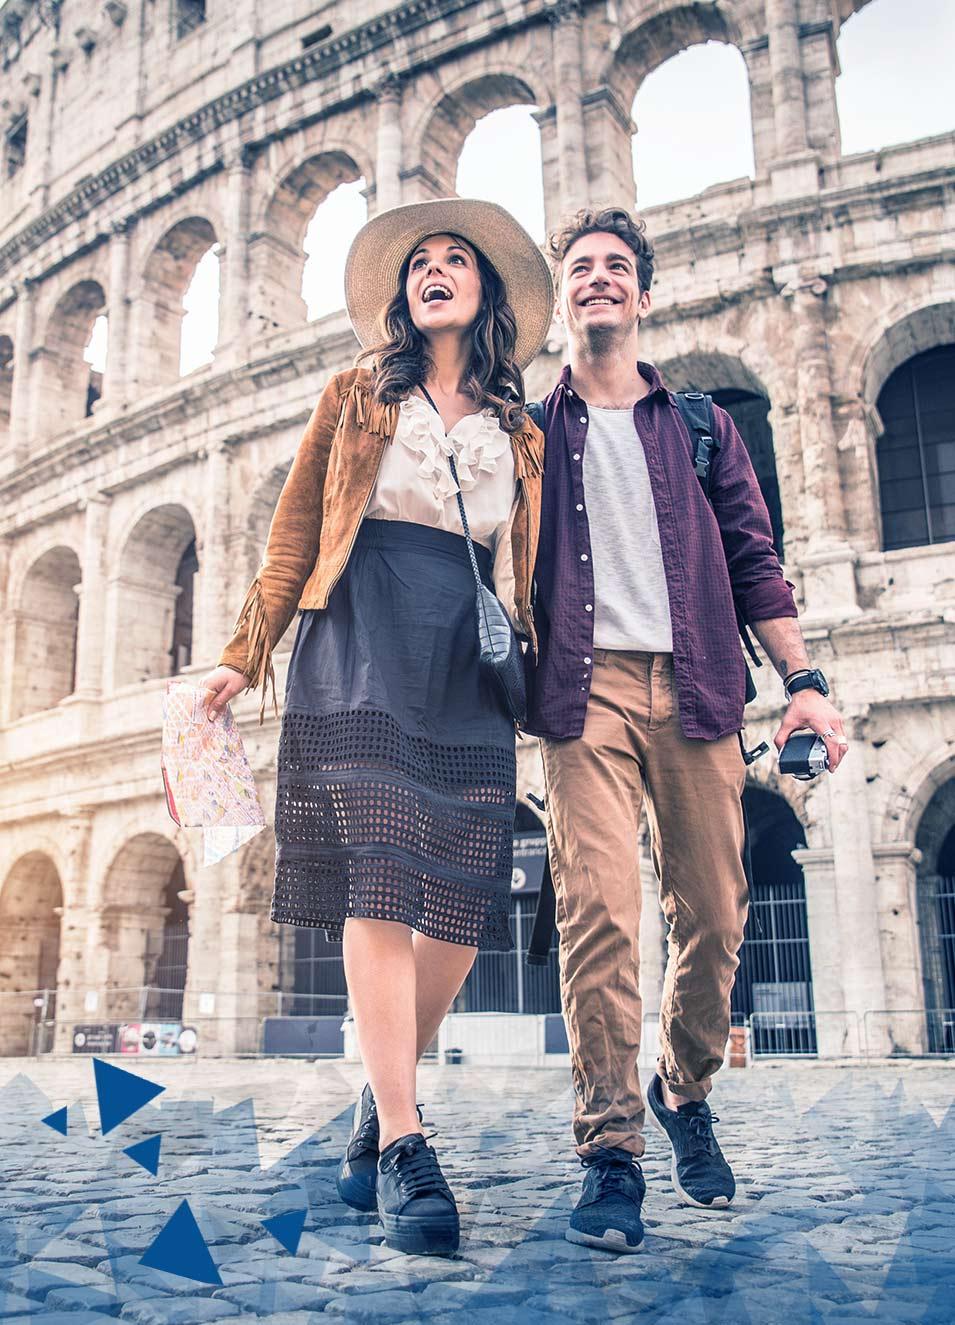 Recorré Roma mientras haces tu pasaporte italiano